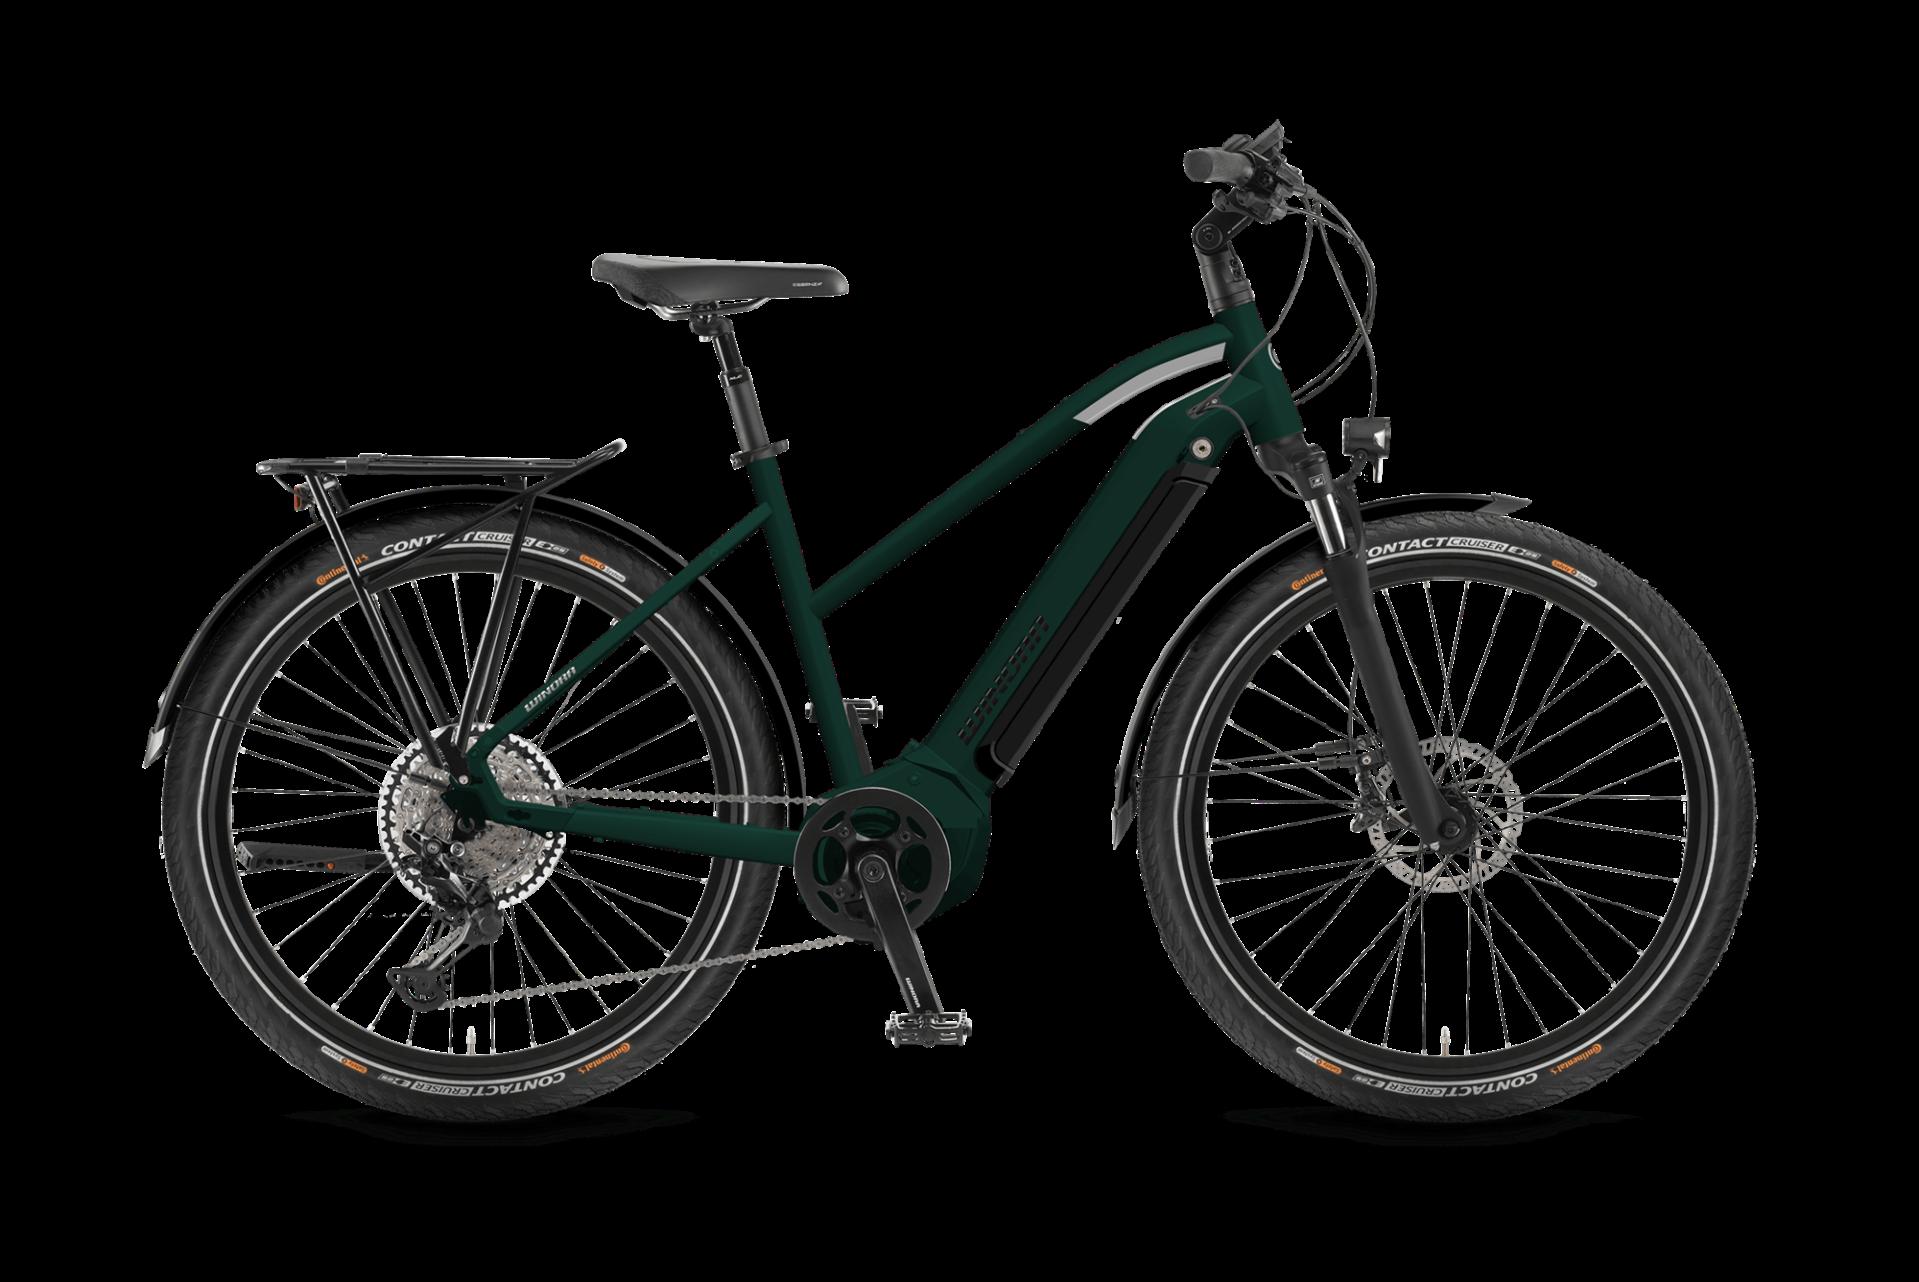 WINORA Yucatan 10 női trekking pedelec kerékpár - 44 cm (2021)